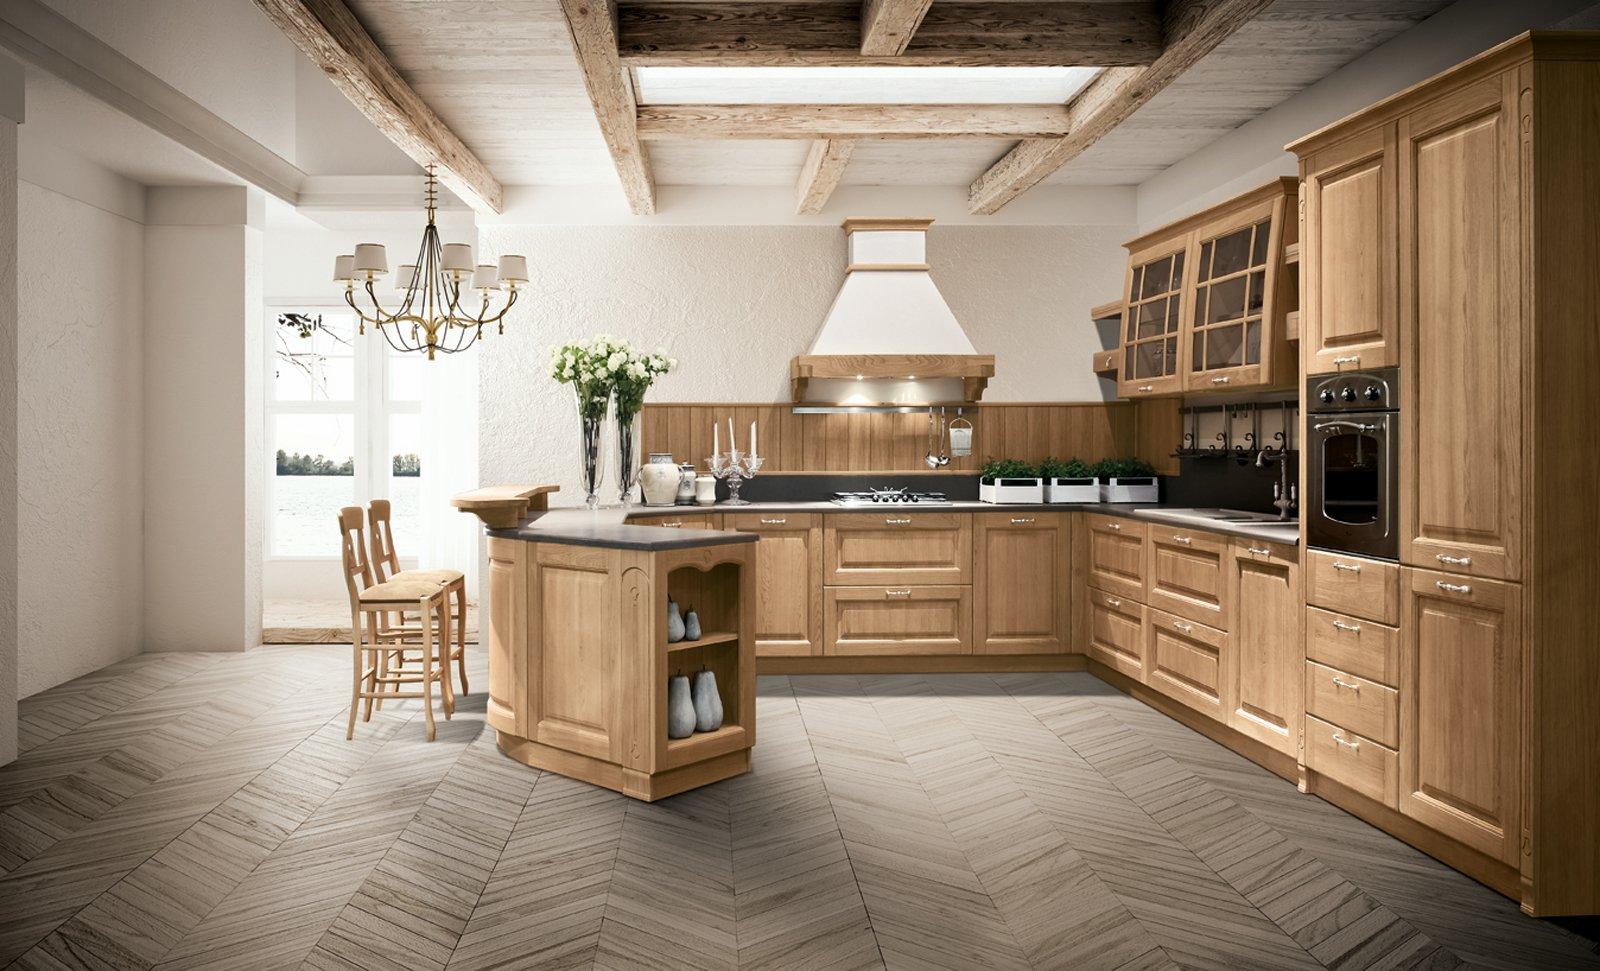 Cucine country chic soprattutto bianche o tinta legno for Cucine bellissime moderne